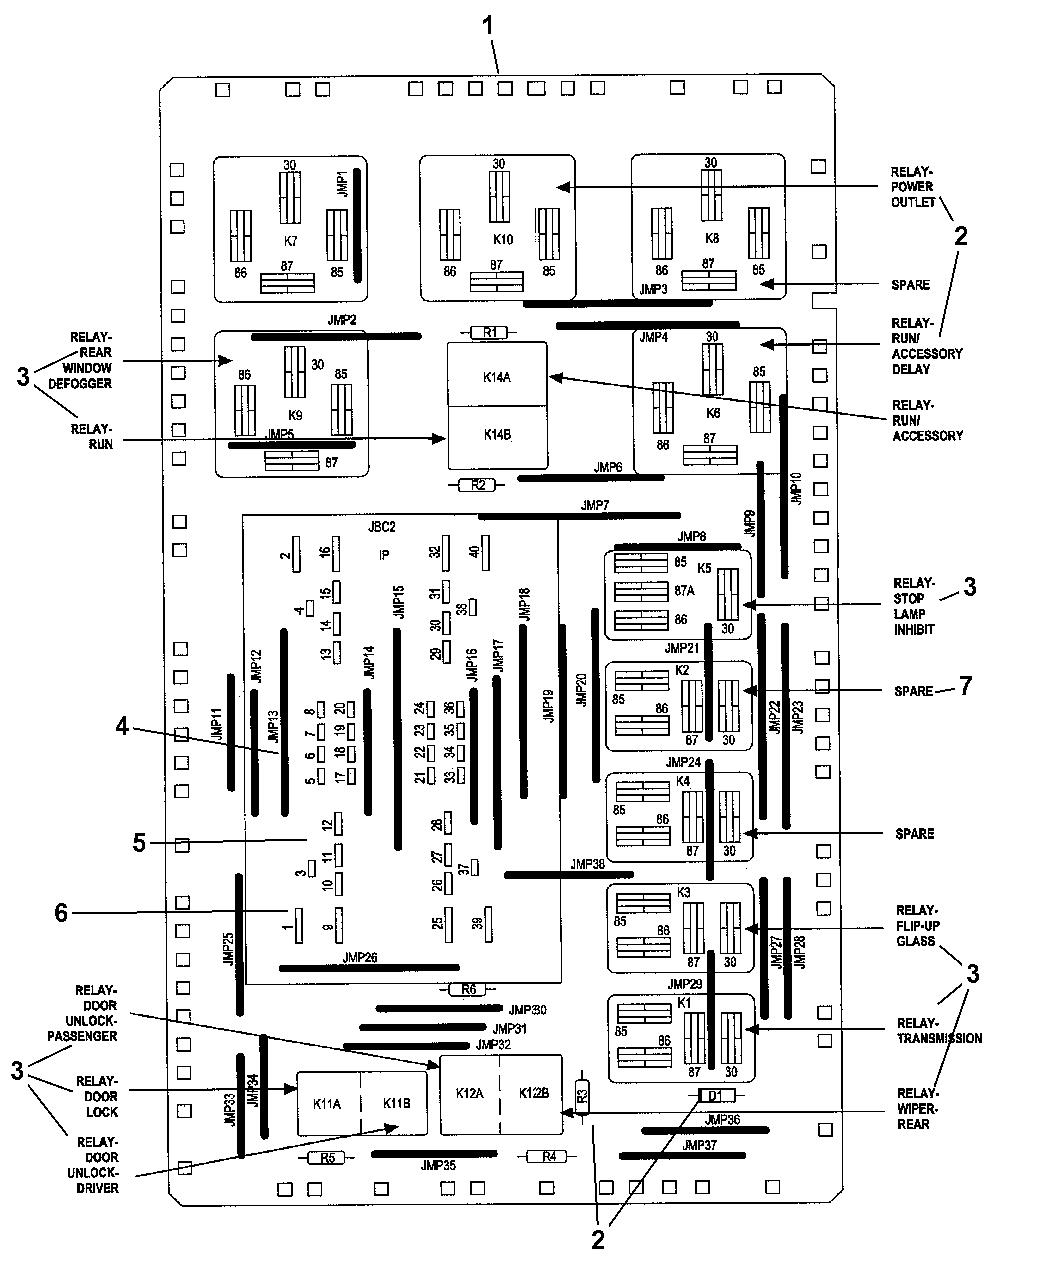 2008 jeep commander junction block fuses, relays, \u0026 circuit breakers Jeep Patriot Wiring Schematic